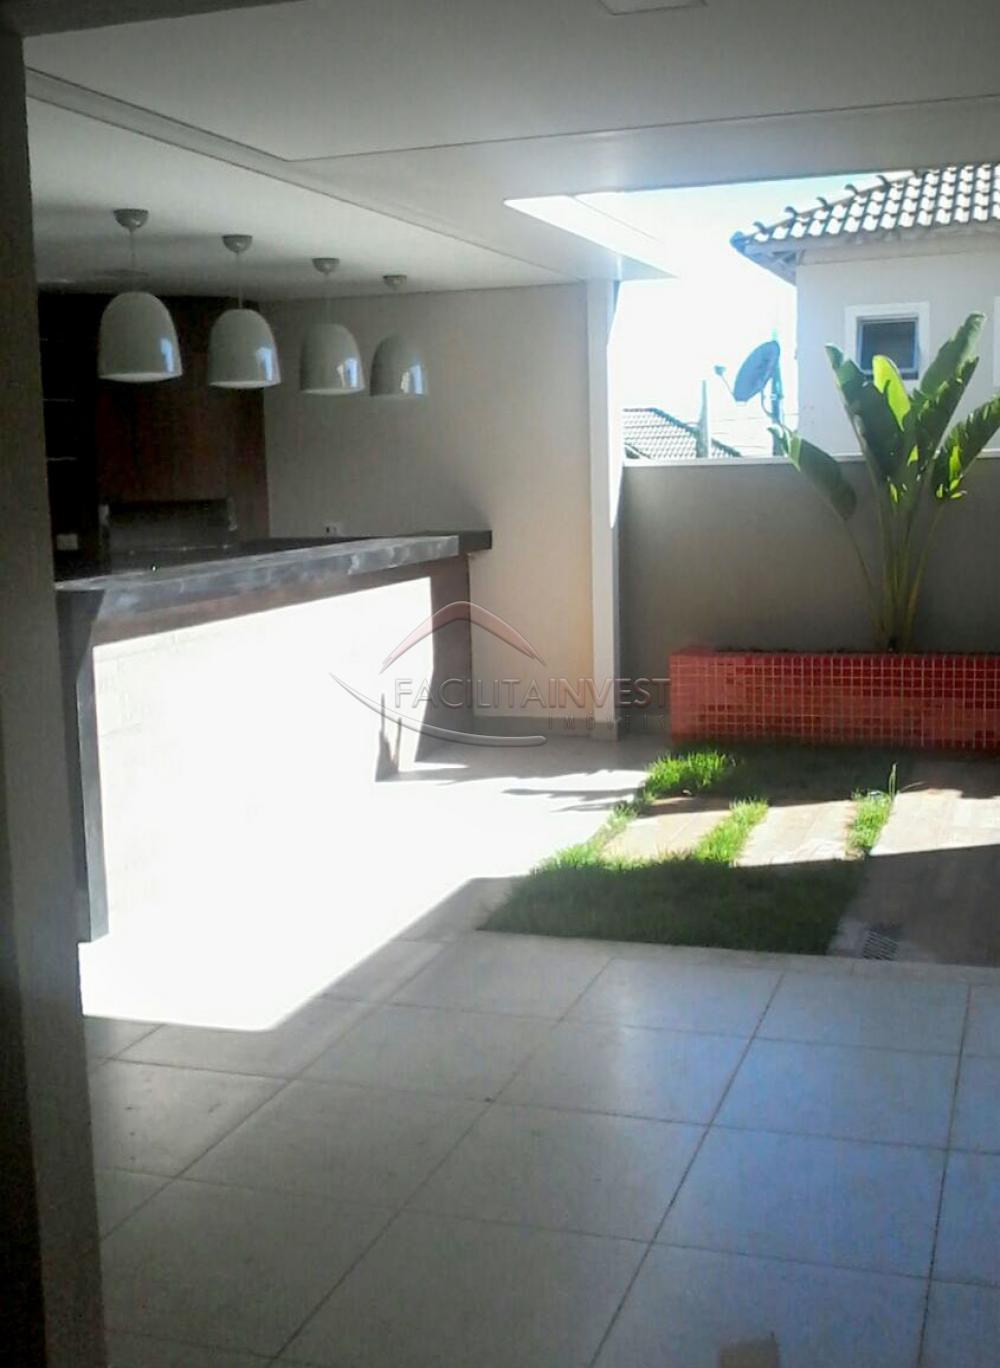 Ribeirao Preto Casa Venda R$550.000,00 Condominio R$380,00 3 Dormitorios 1 Suite Area do terreno 160.00m2 Area construida 110.00m2